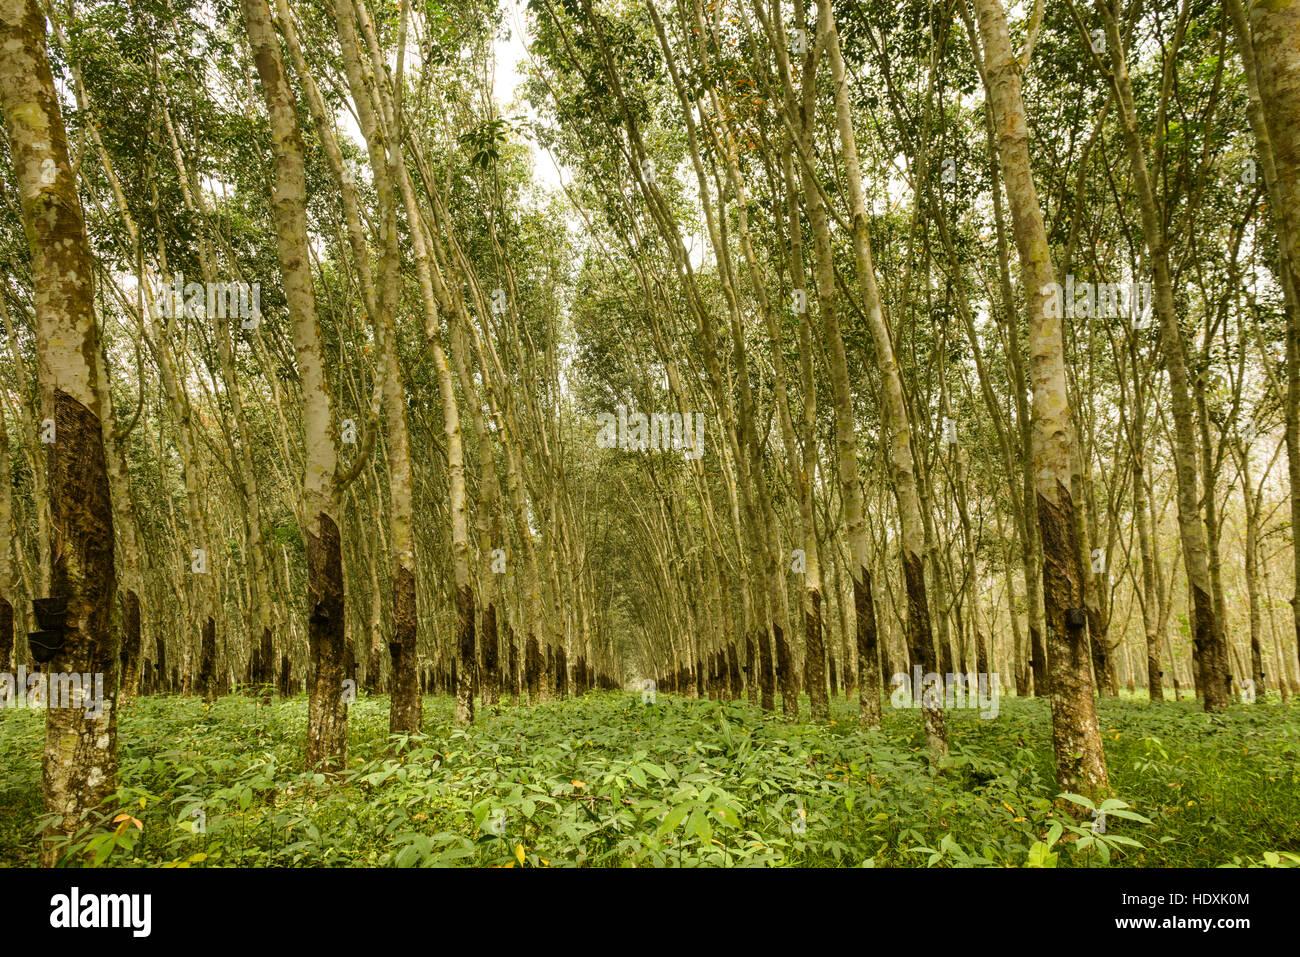 Rubber tree plantations, Ivory Coast - Stock Image